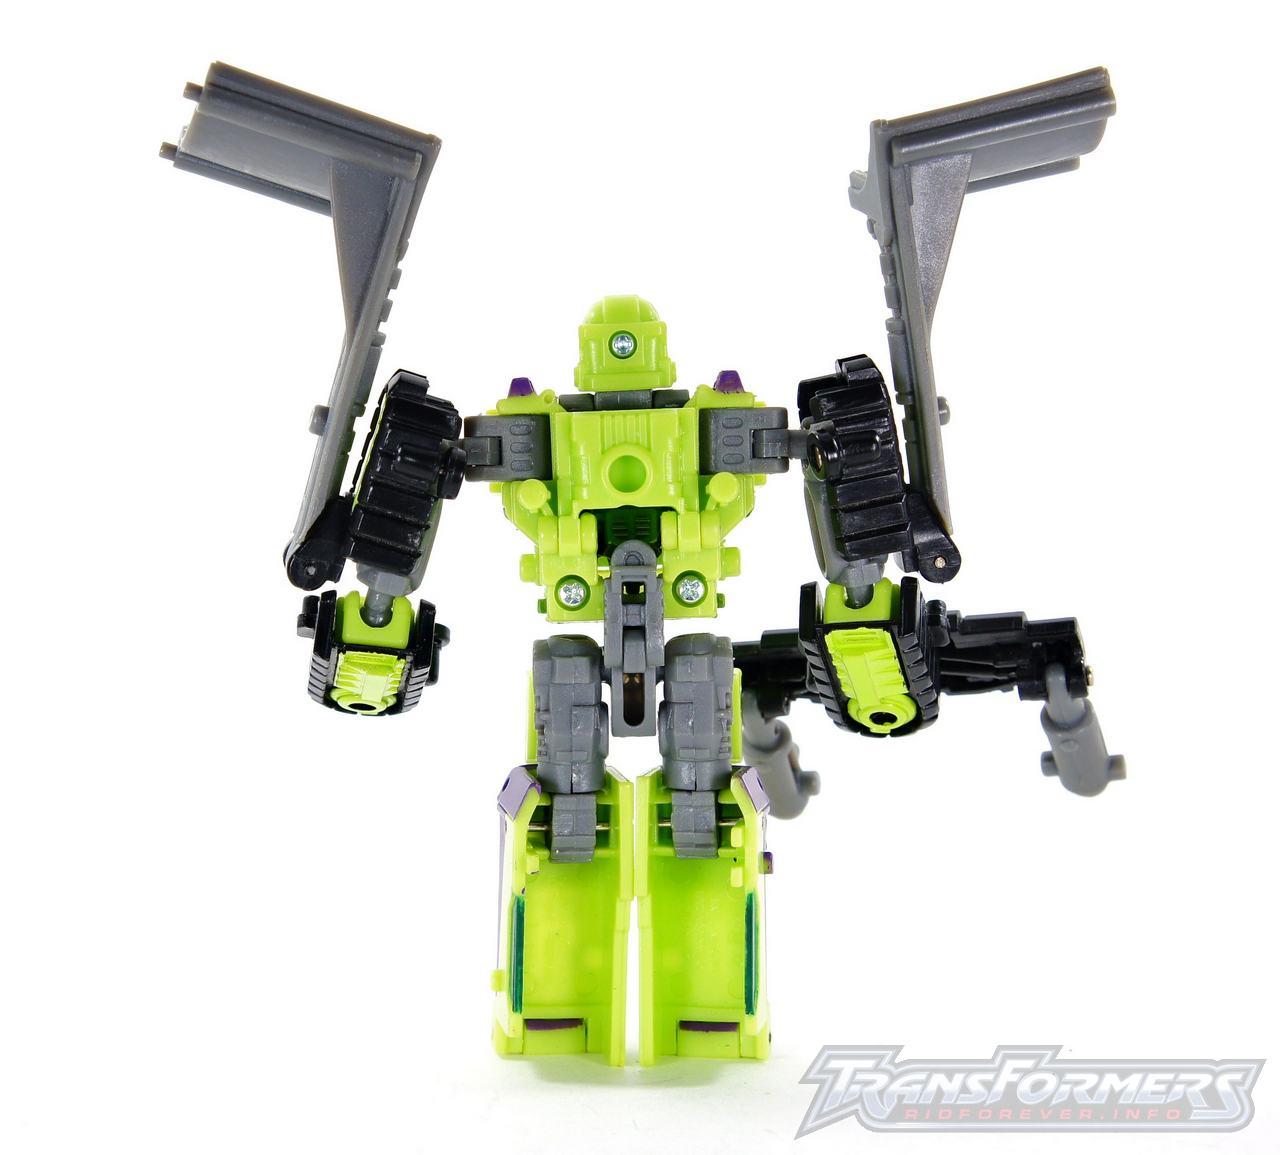 Bonecrusher-008